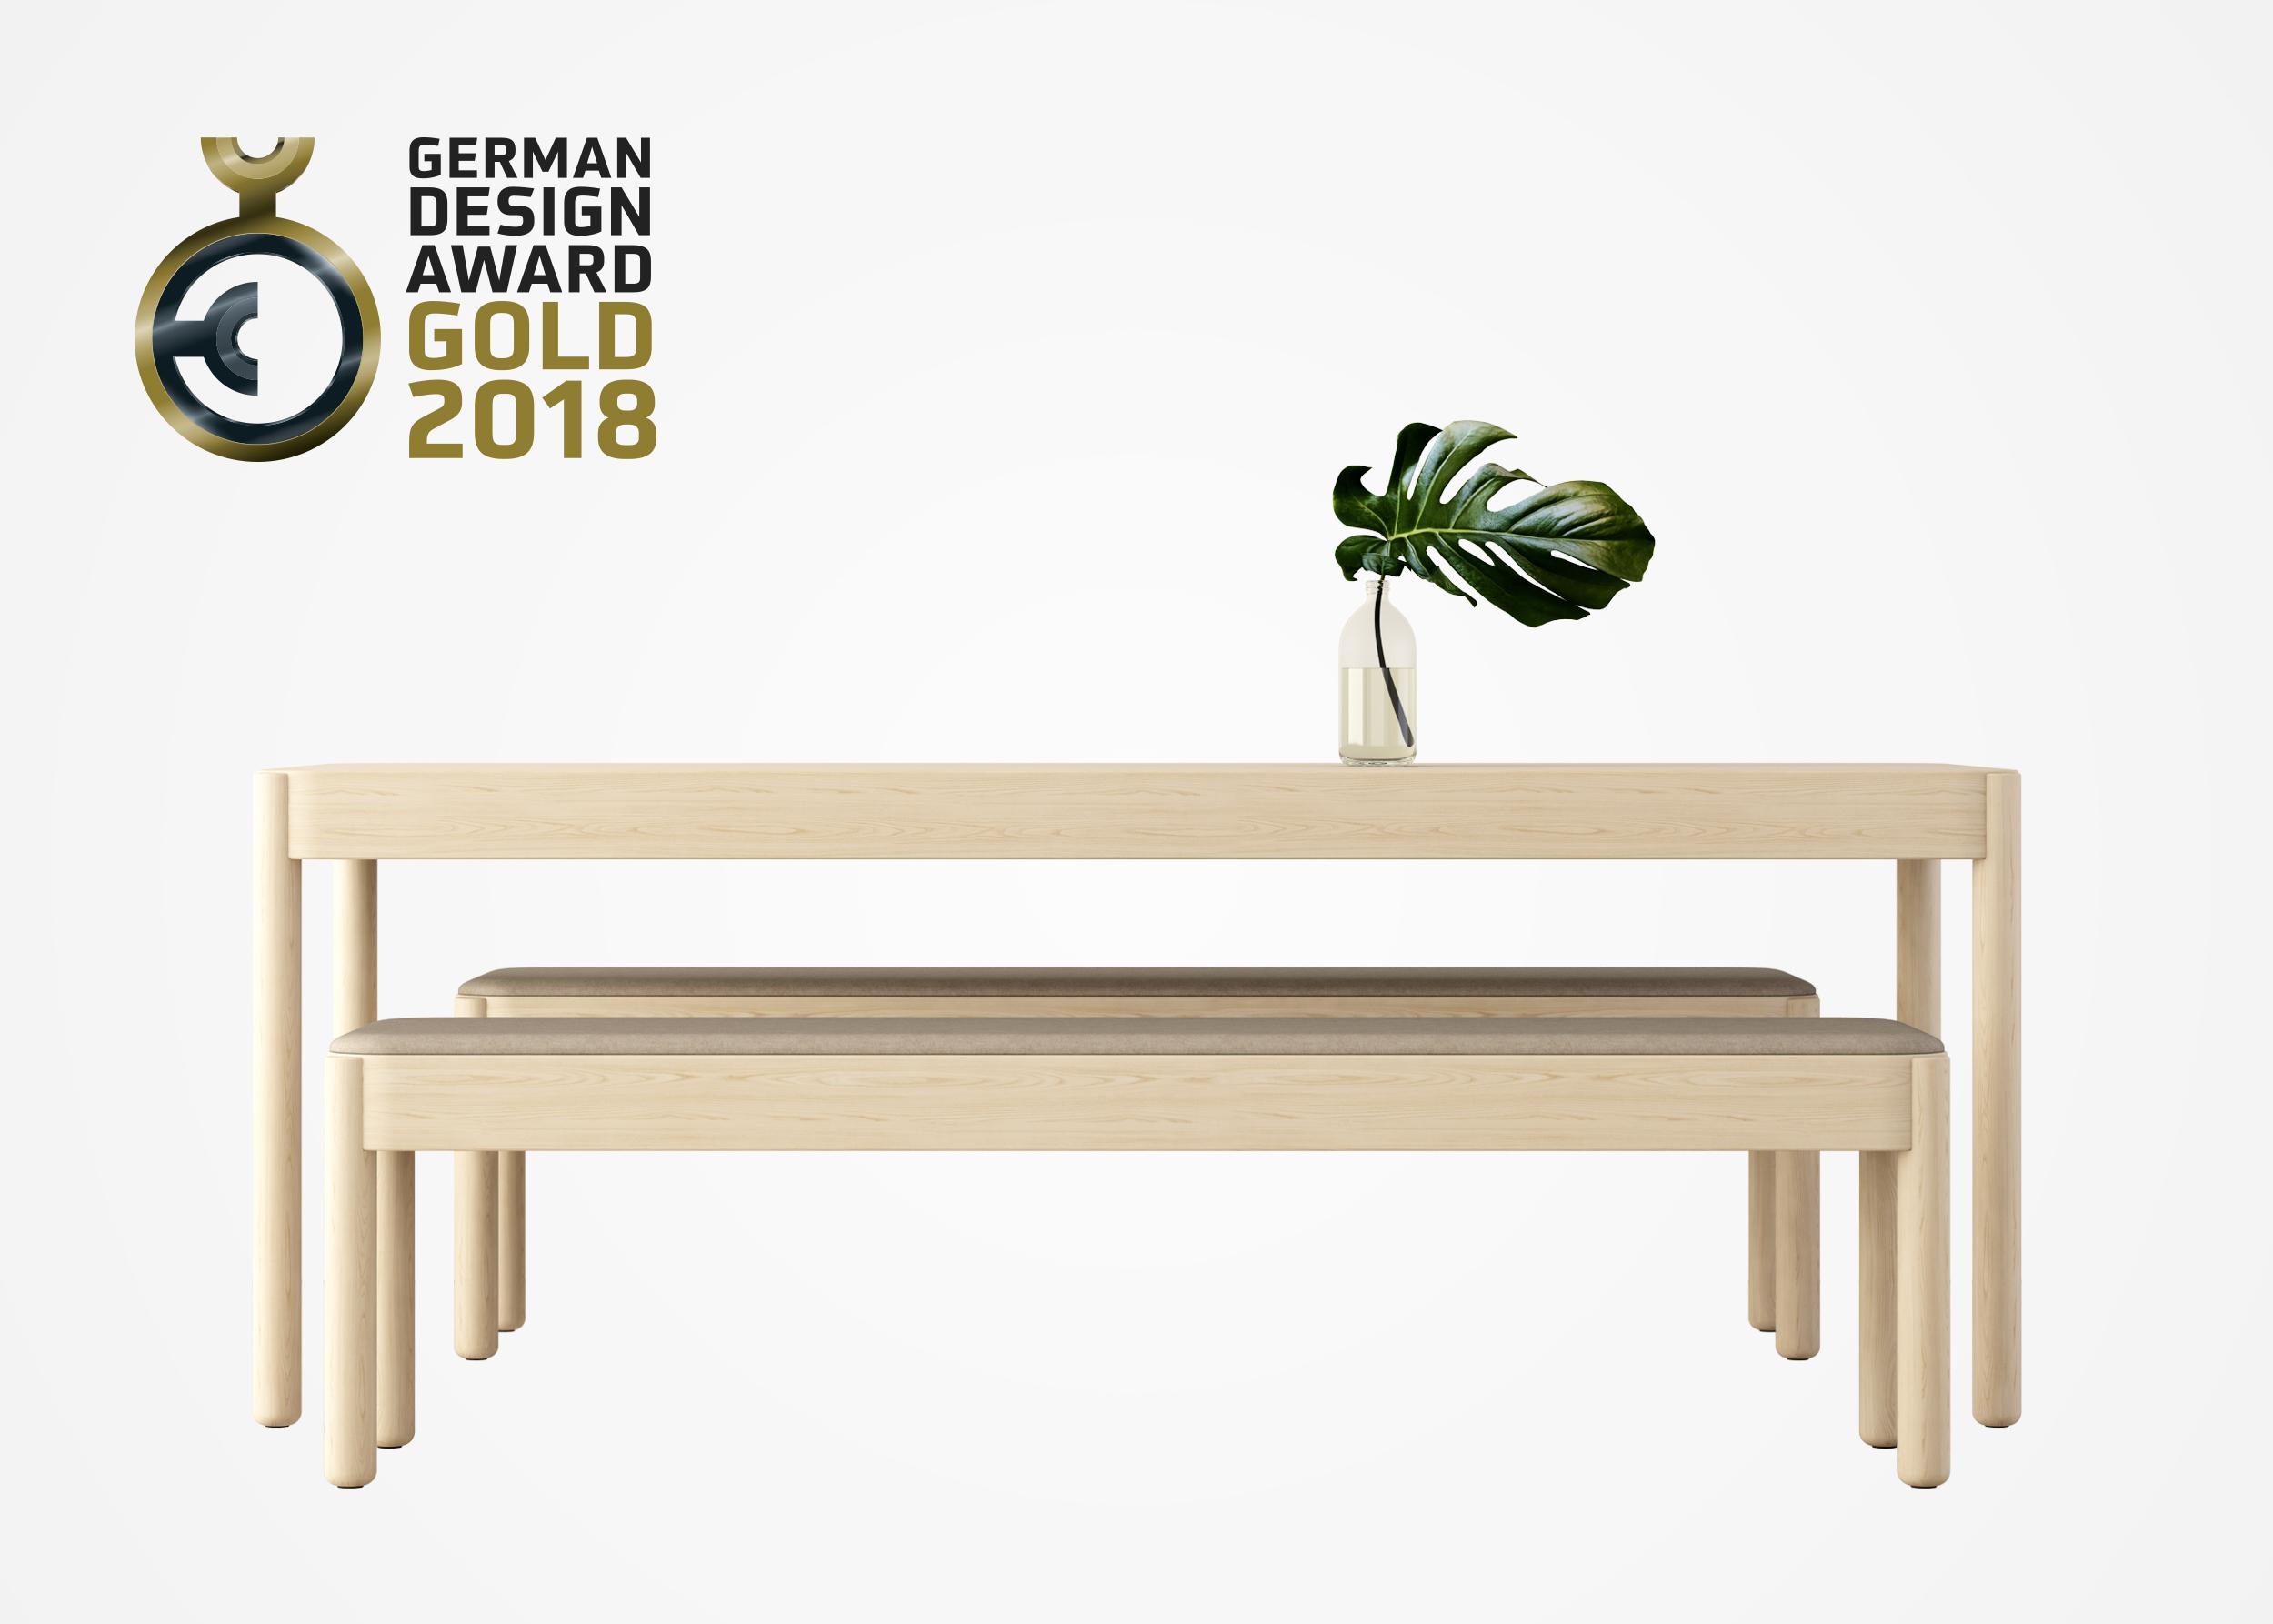 Wakufuru by Glimakra of Sweden, design Johan Kauppi. Gold winner, German Design Award 2018.